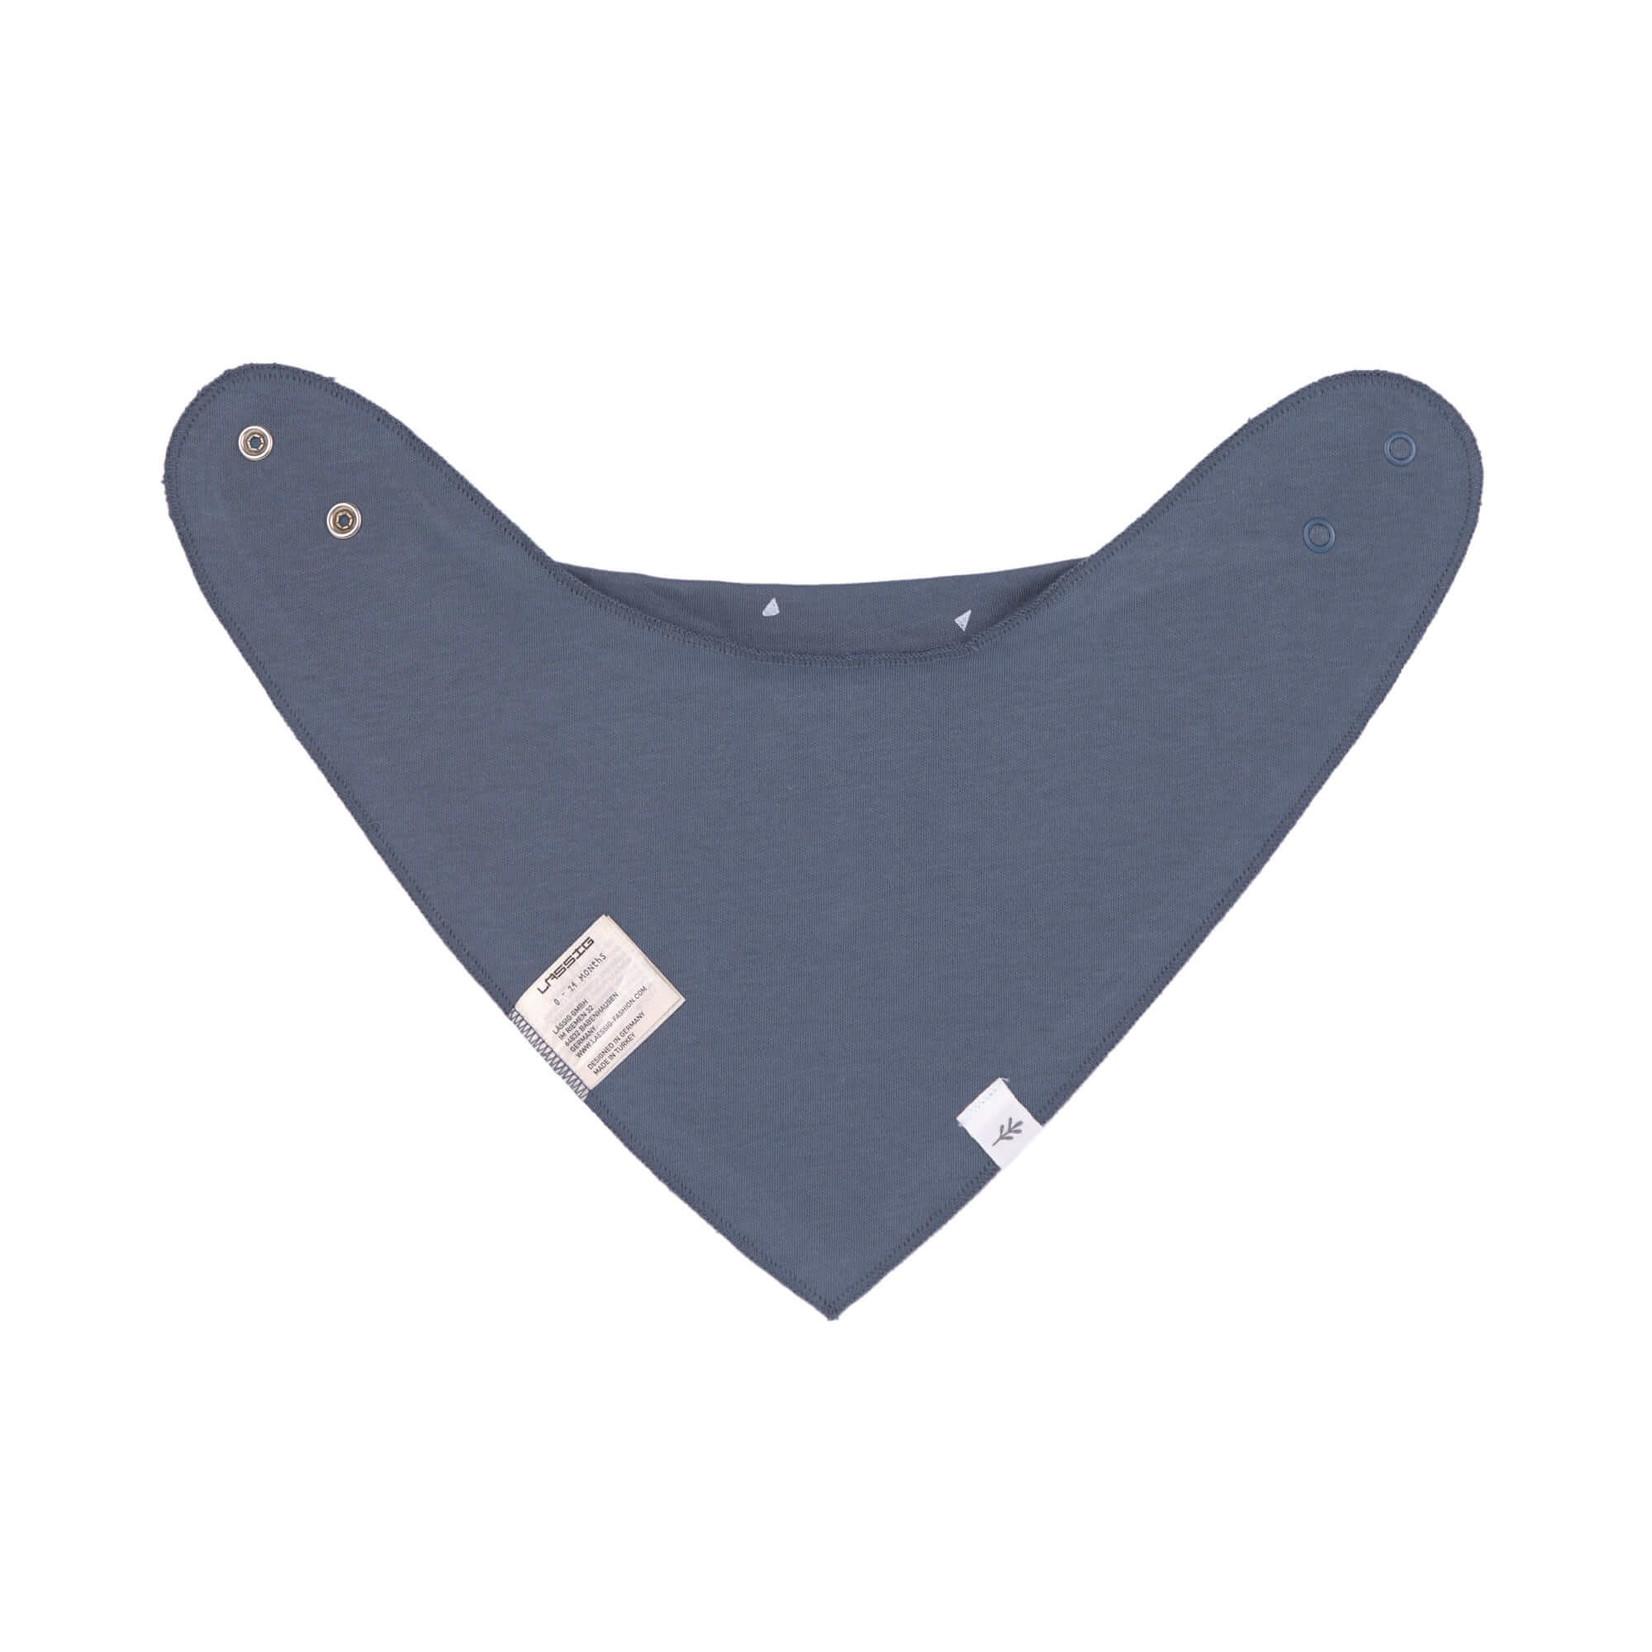 Lässig Interlock Bandana cowl-neck, 2 pcs. GOTS Triangle blue/Striped grey melange